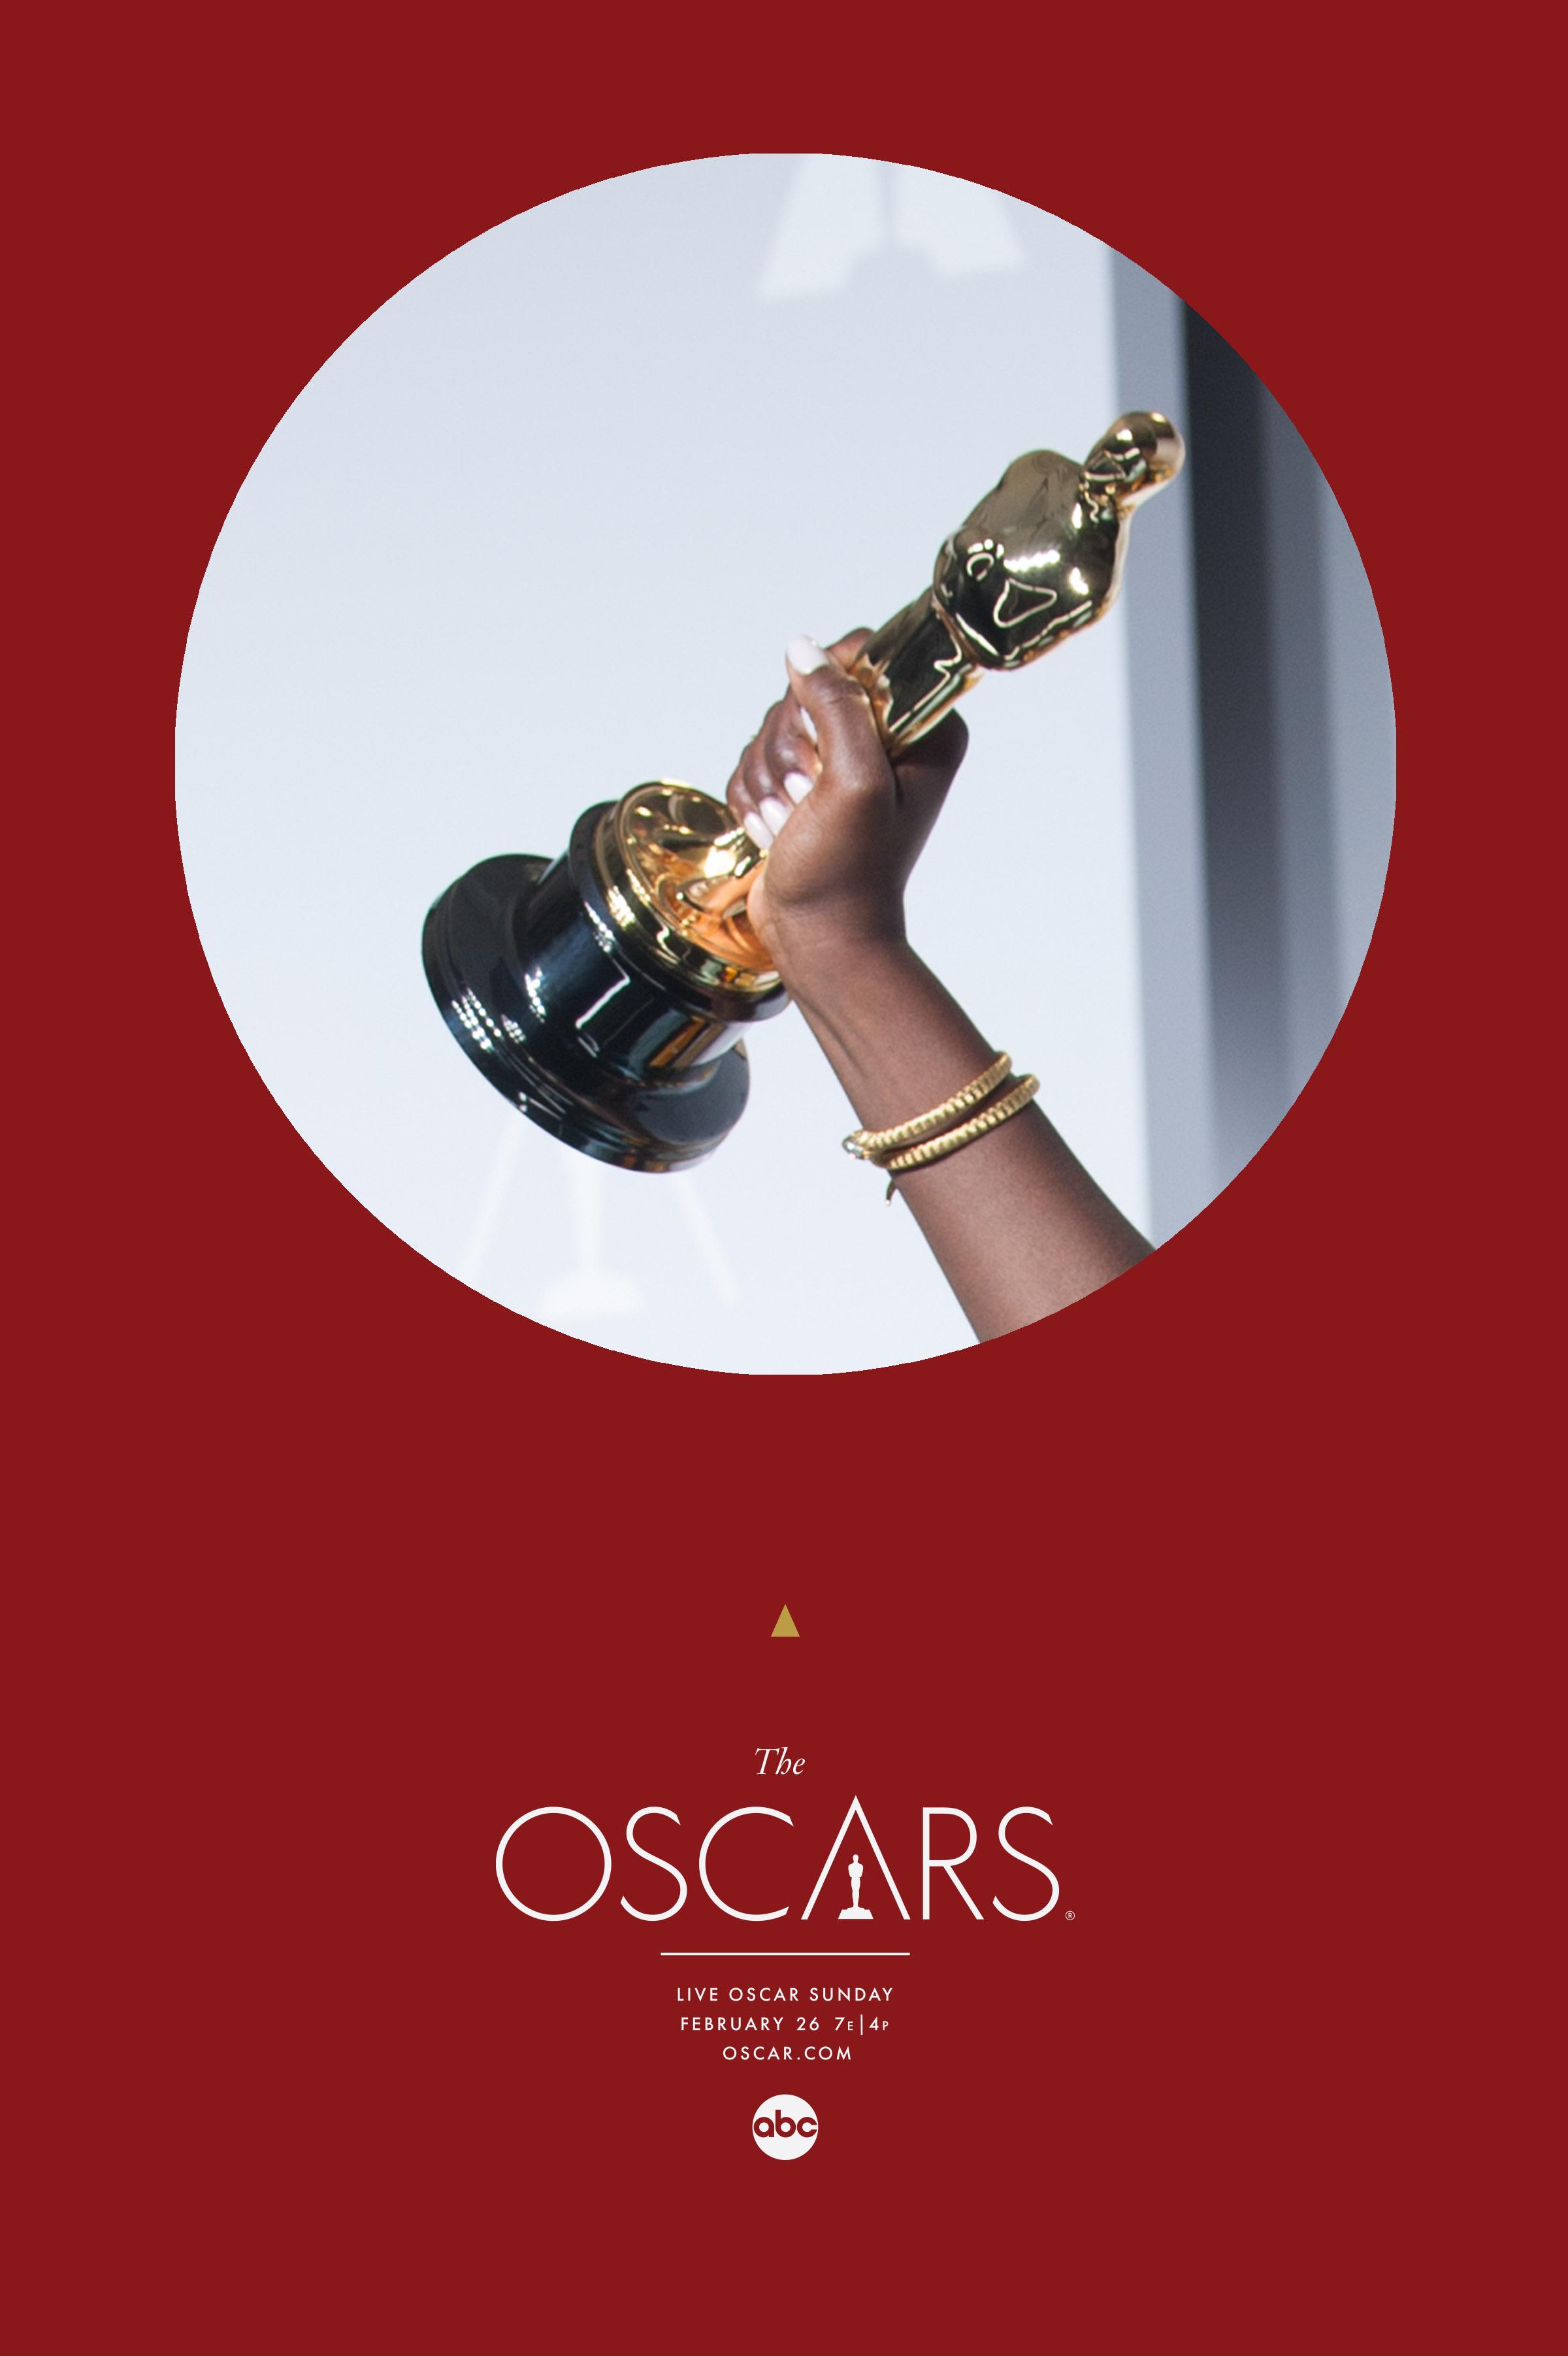 Oscar_ad_2.jpg